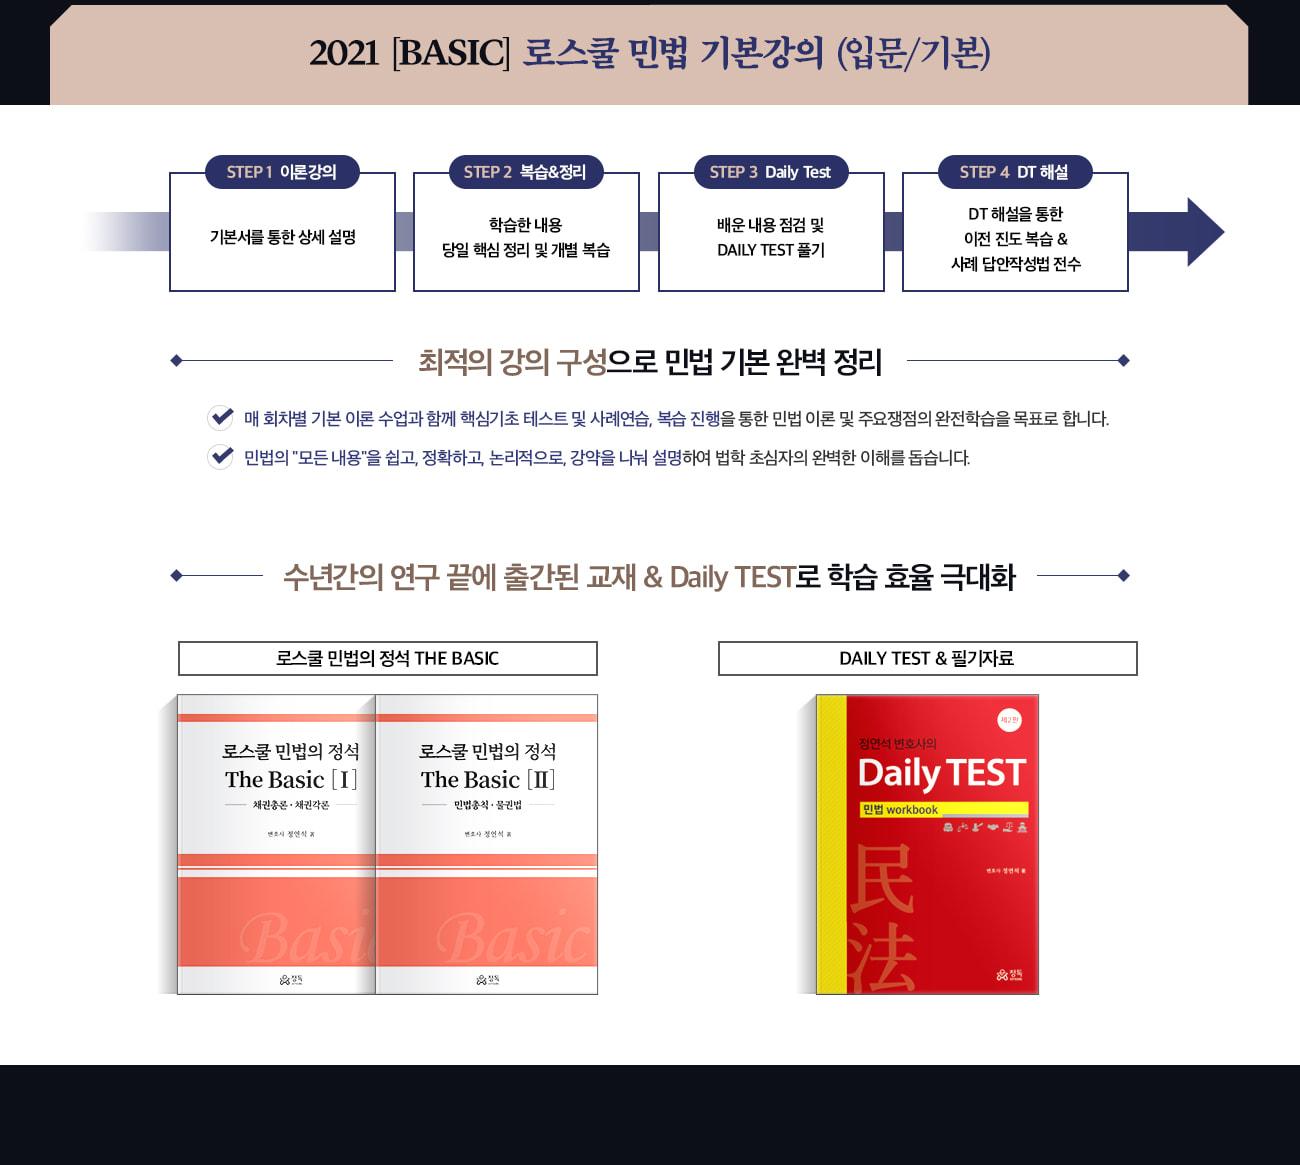 2021 [Basic] 로스쿨 민법 기본강의 [입문/기본]